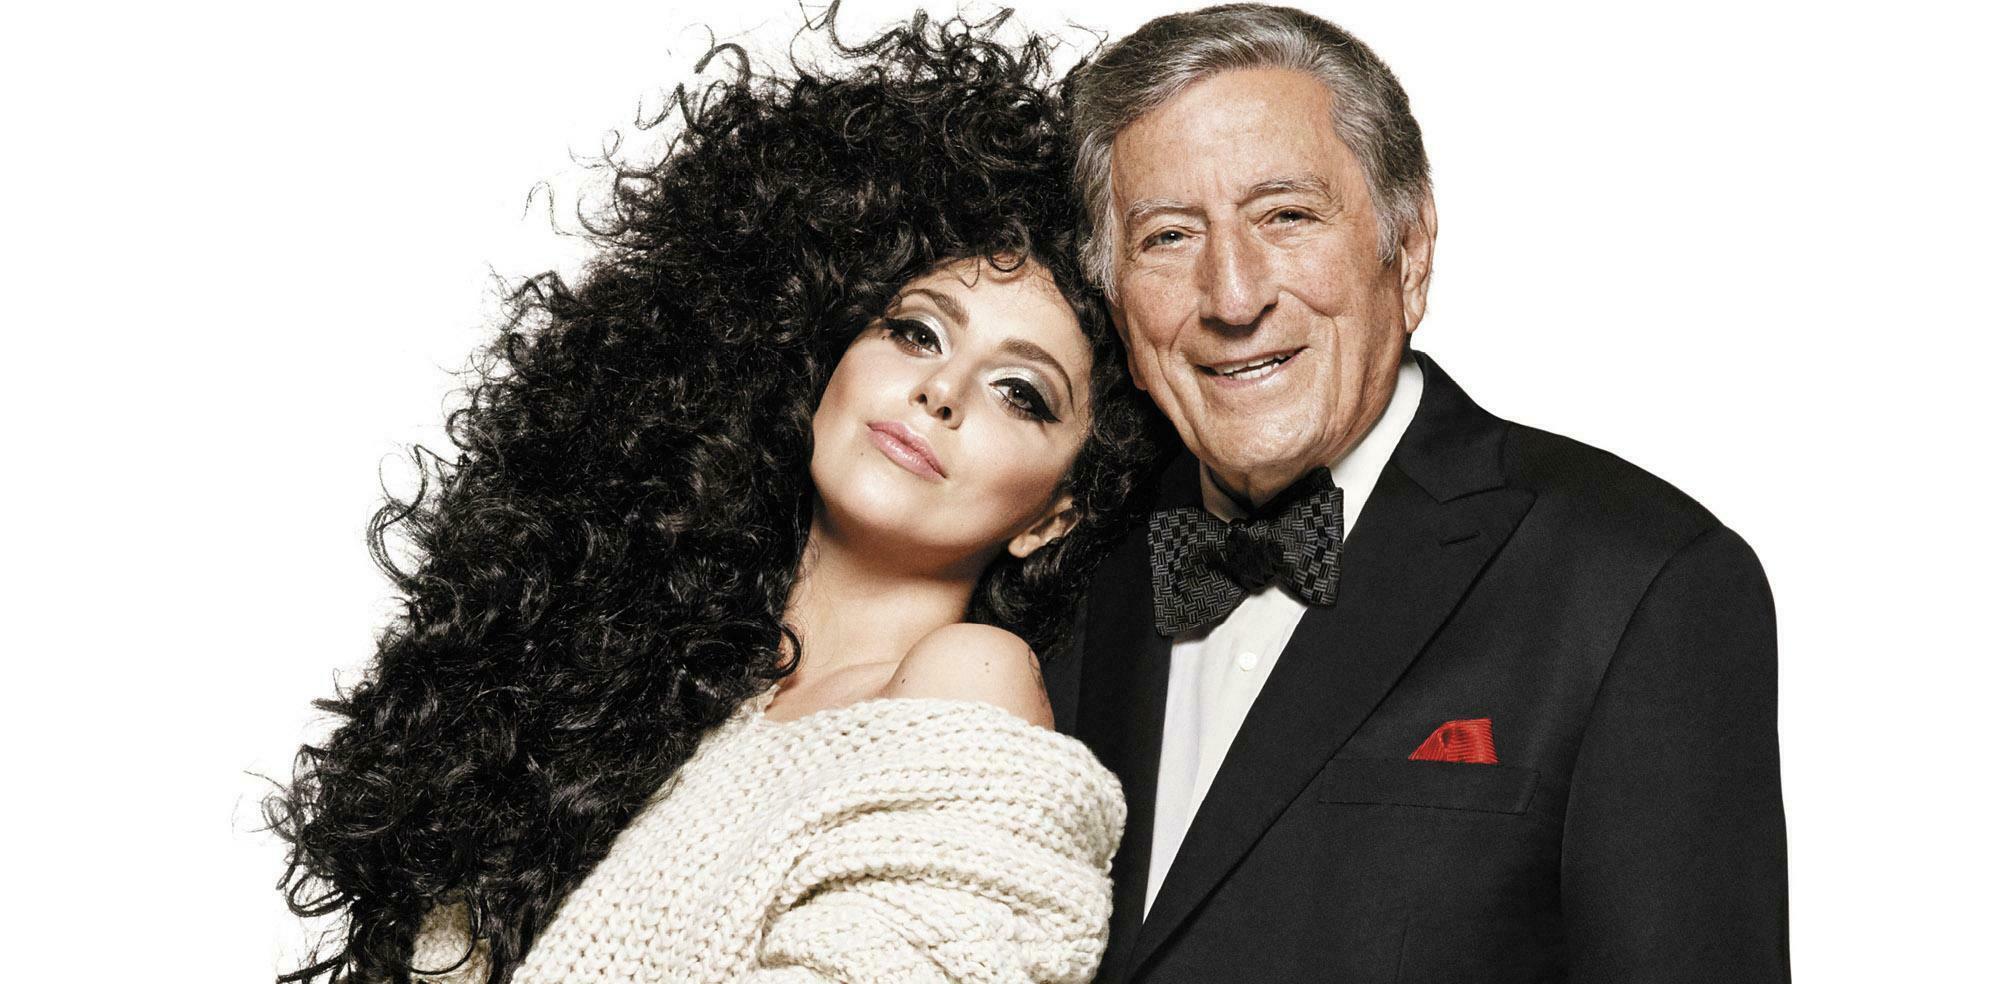 H&M Holiday 2014 - PRESS ART - Lady Gaga & Tony Bennett - HANDOUT